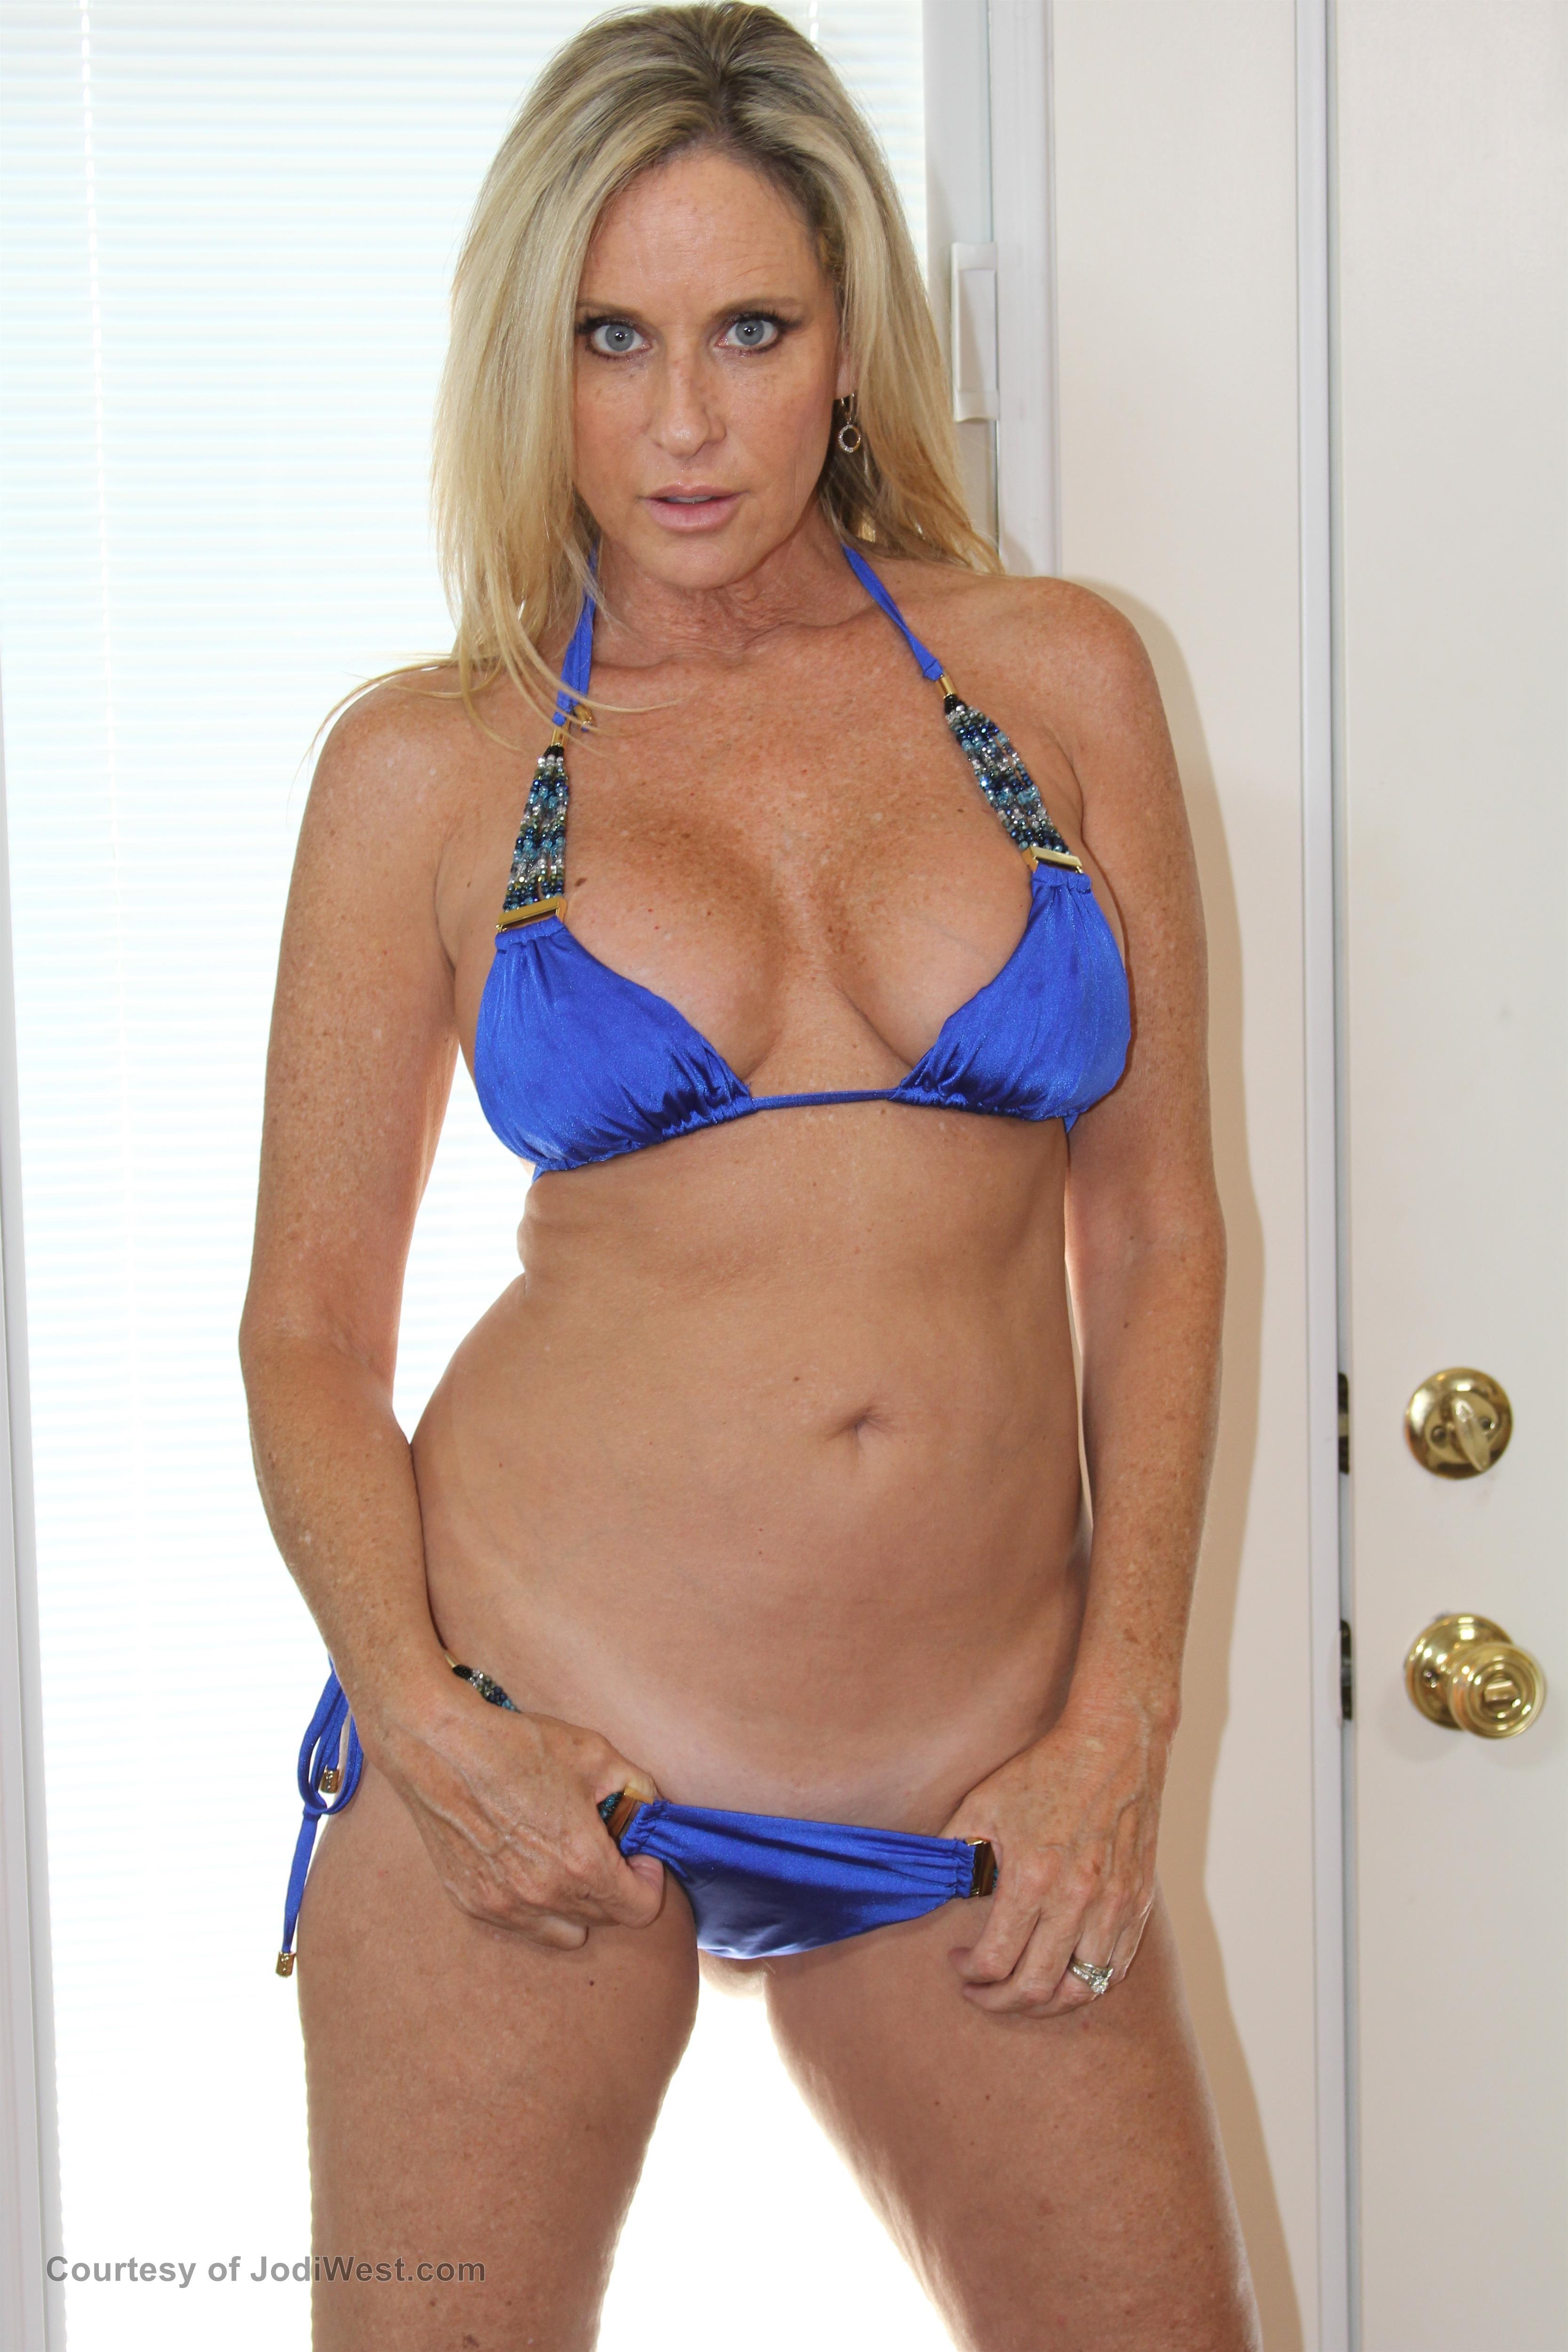 Jodi West Models Sexy Blue Bikini Image Gallery Photos -2918